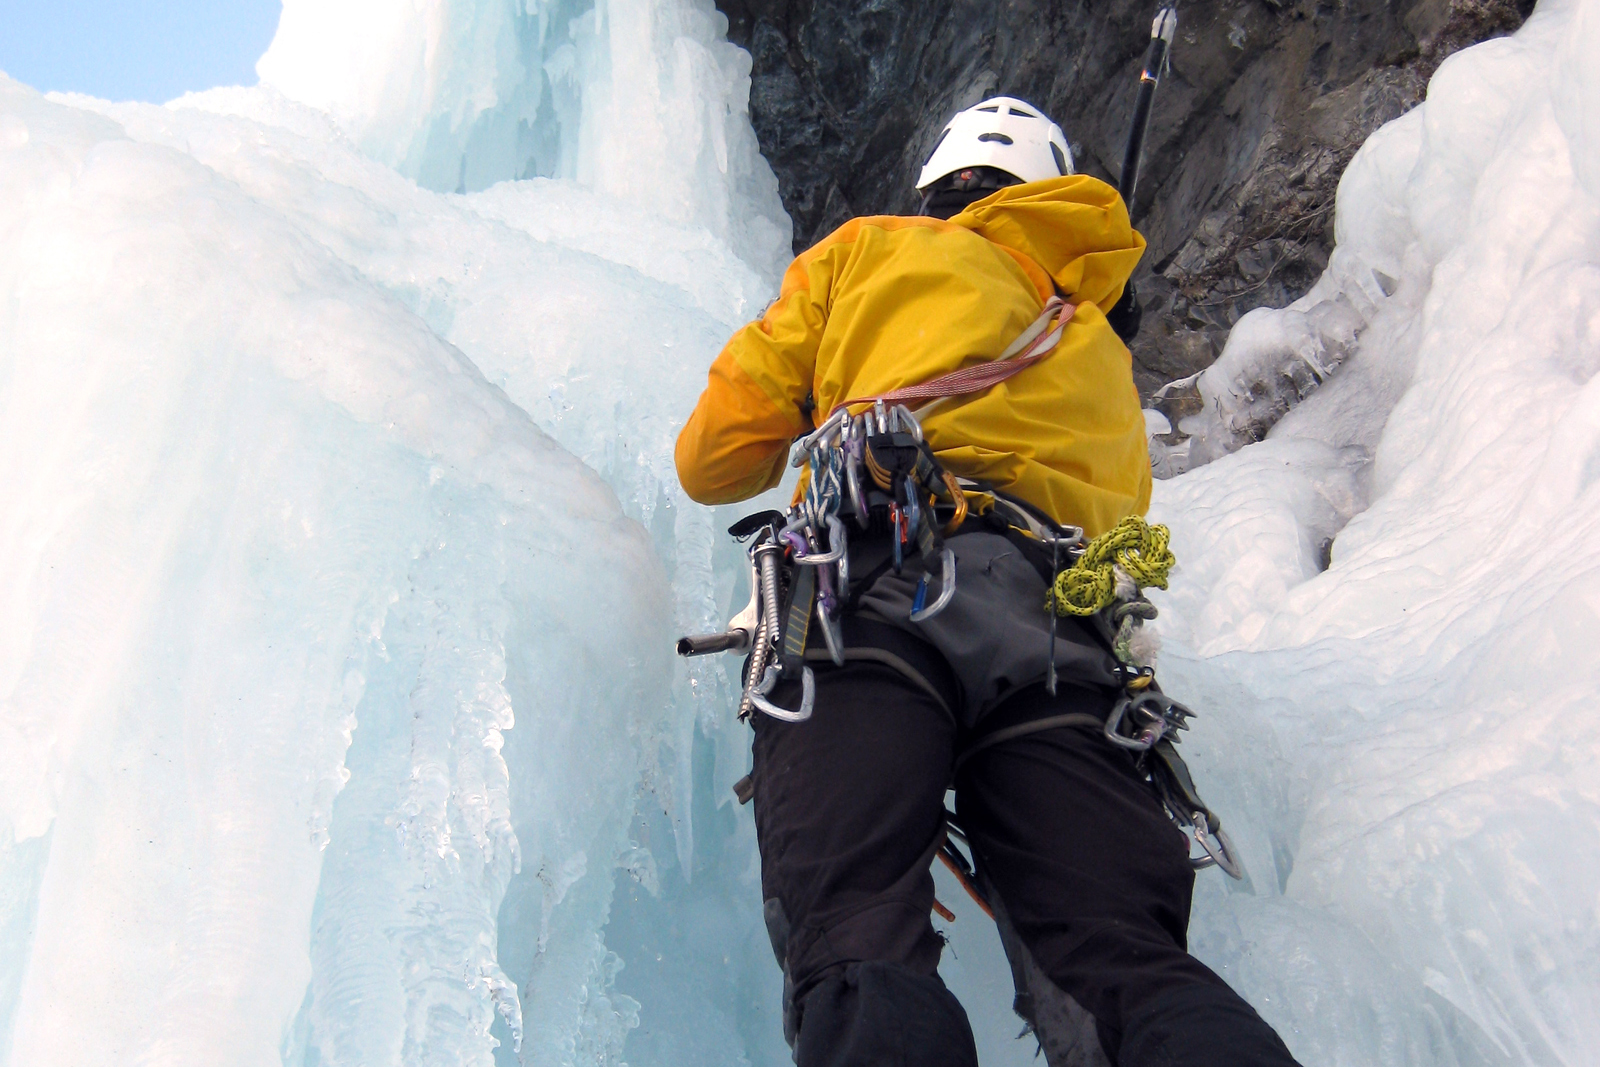 Calendrier sorties - initiation cascade de glace 1/2 journée